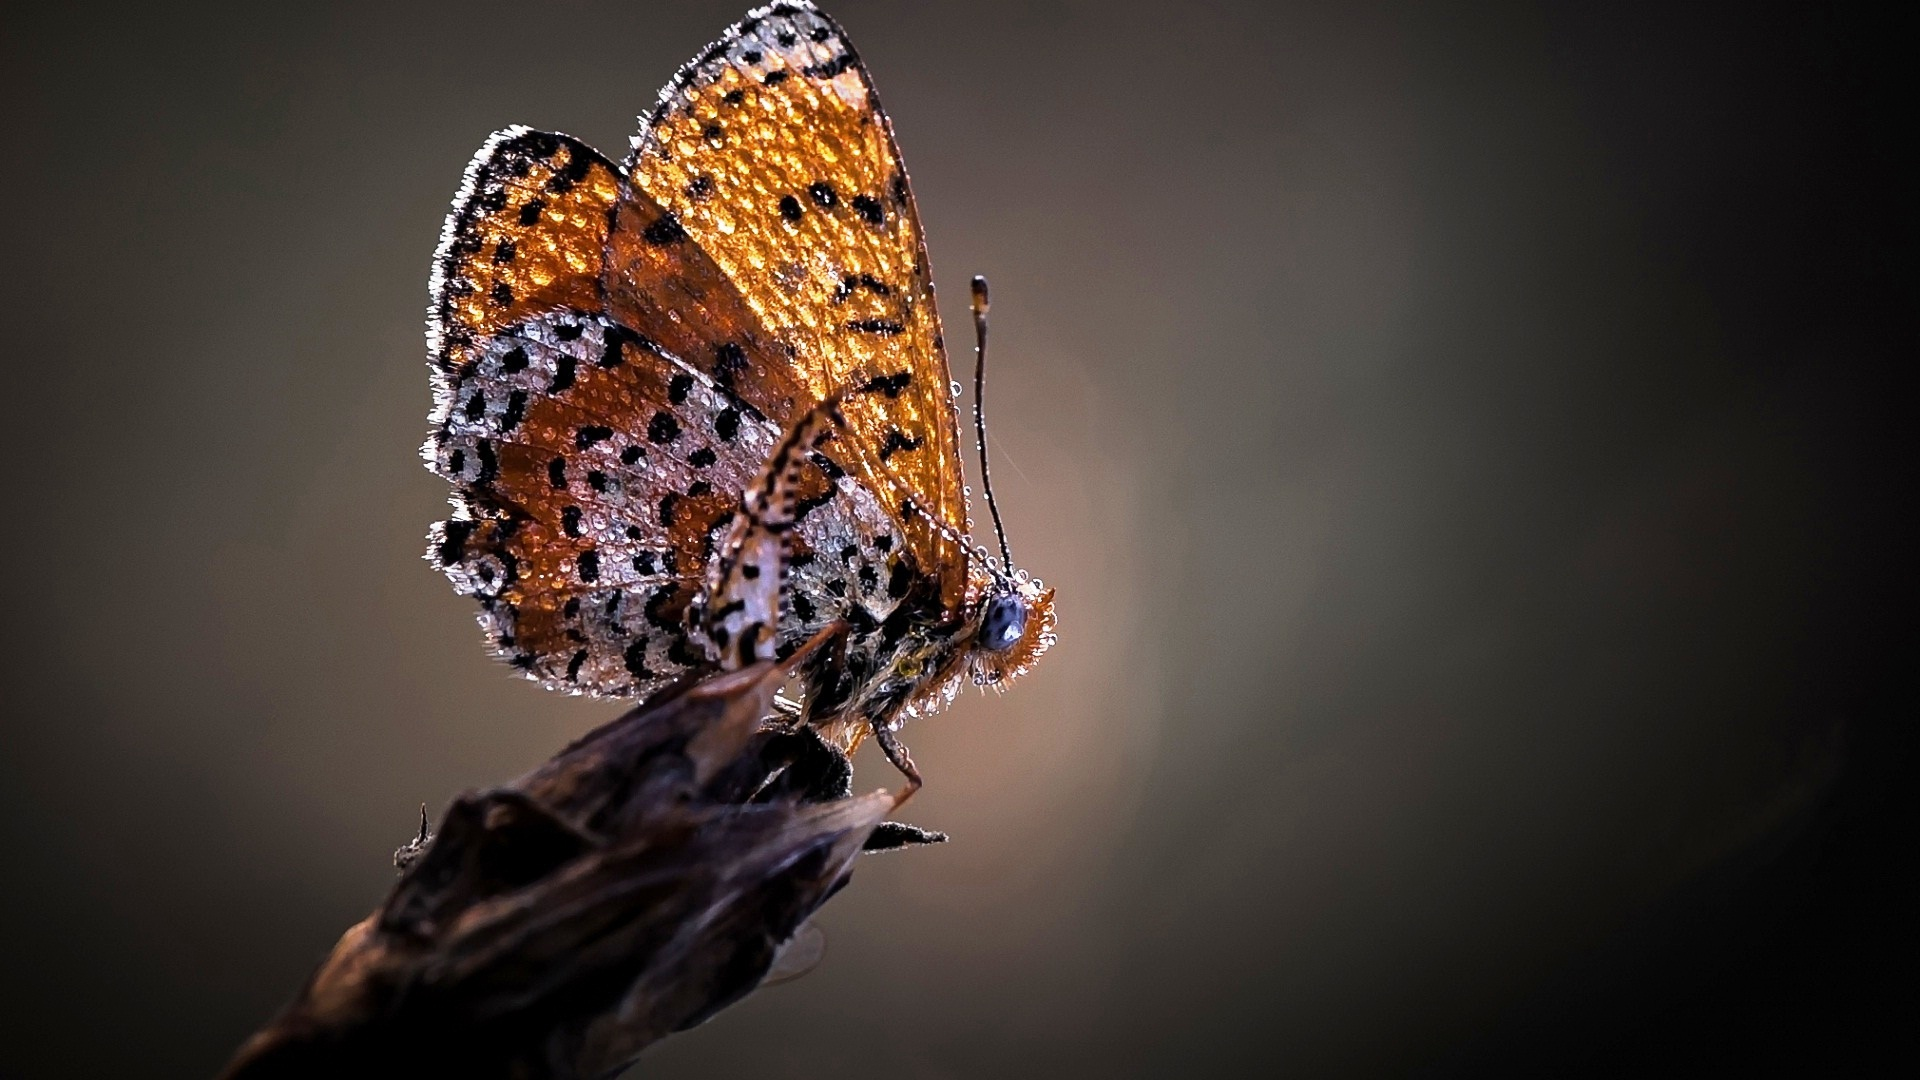 Black Butterfly Superb Wallpapers Wallpaper 1920x1080 Wallpaper Teahub Io